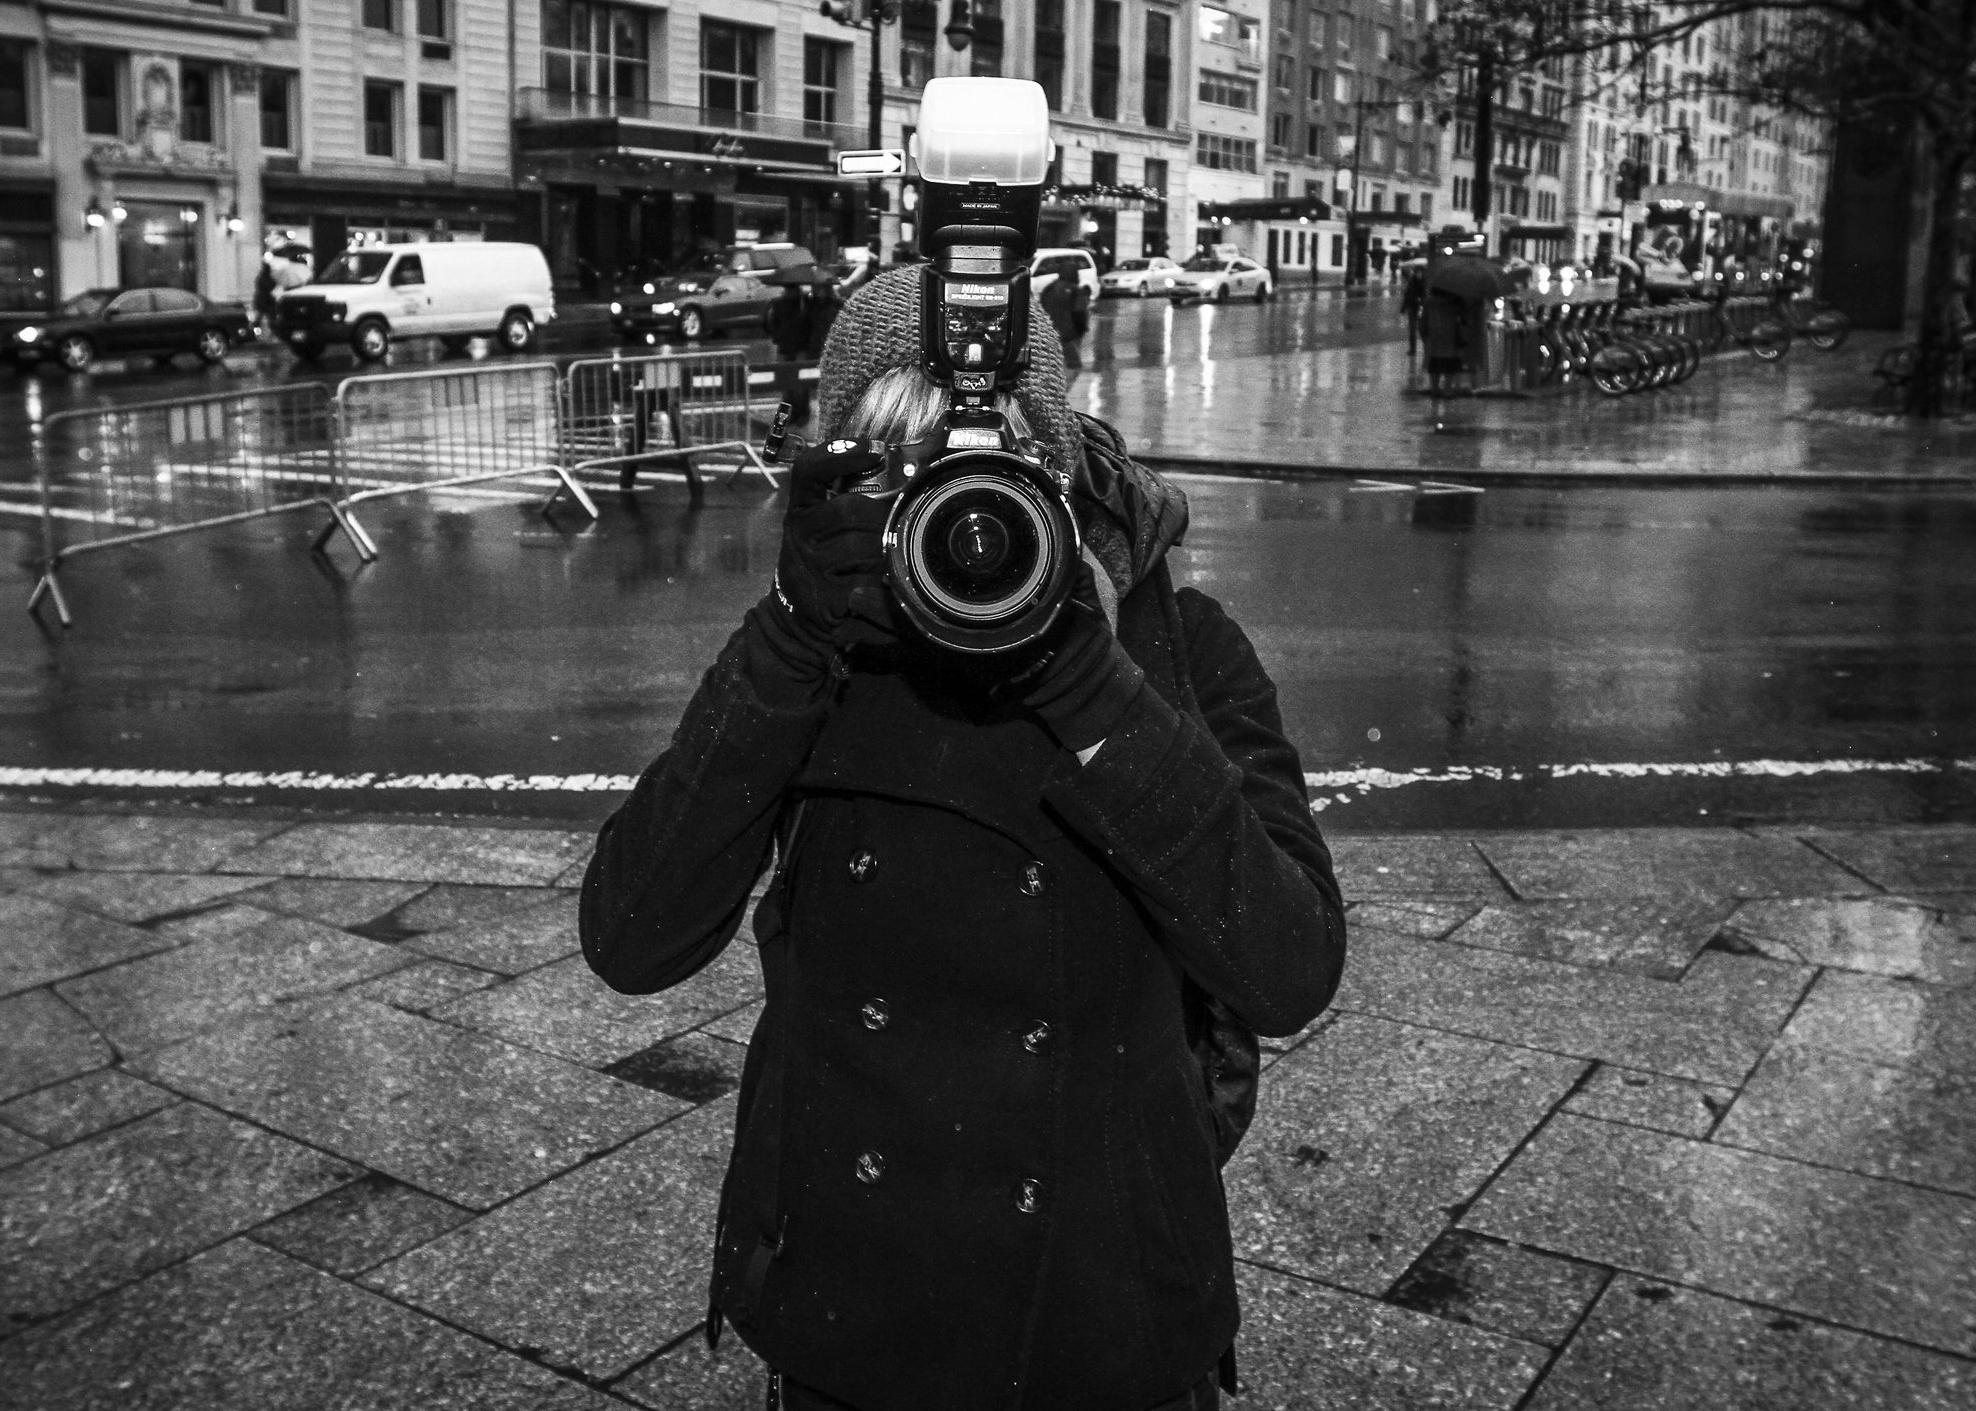 Nicola shooting in New York